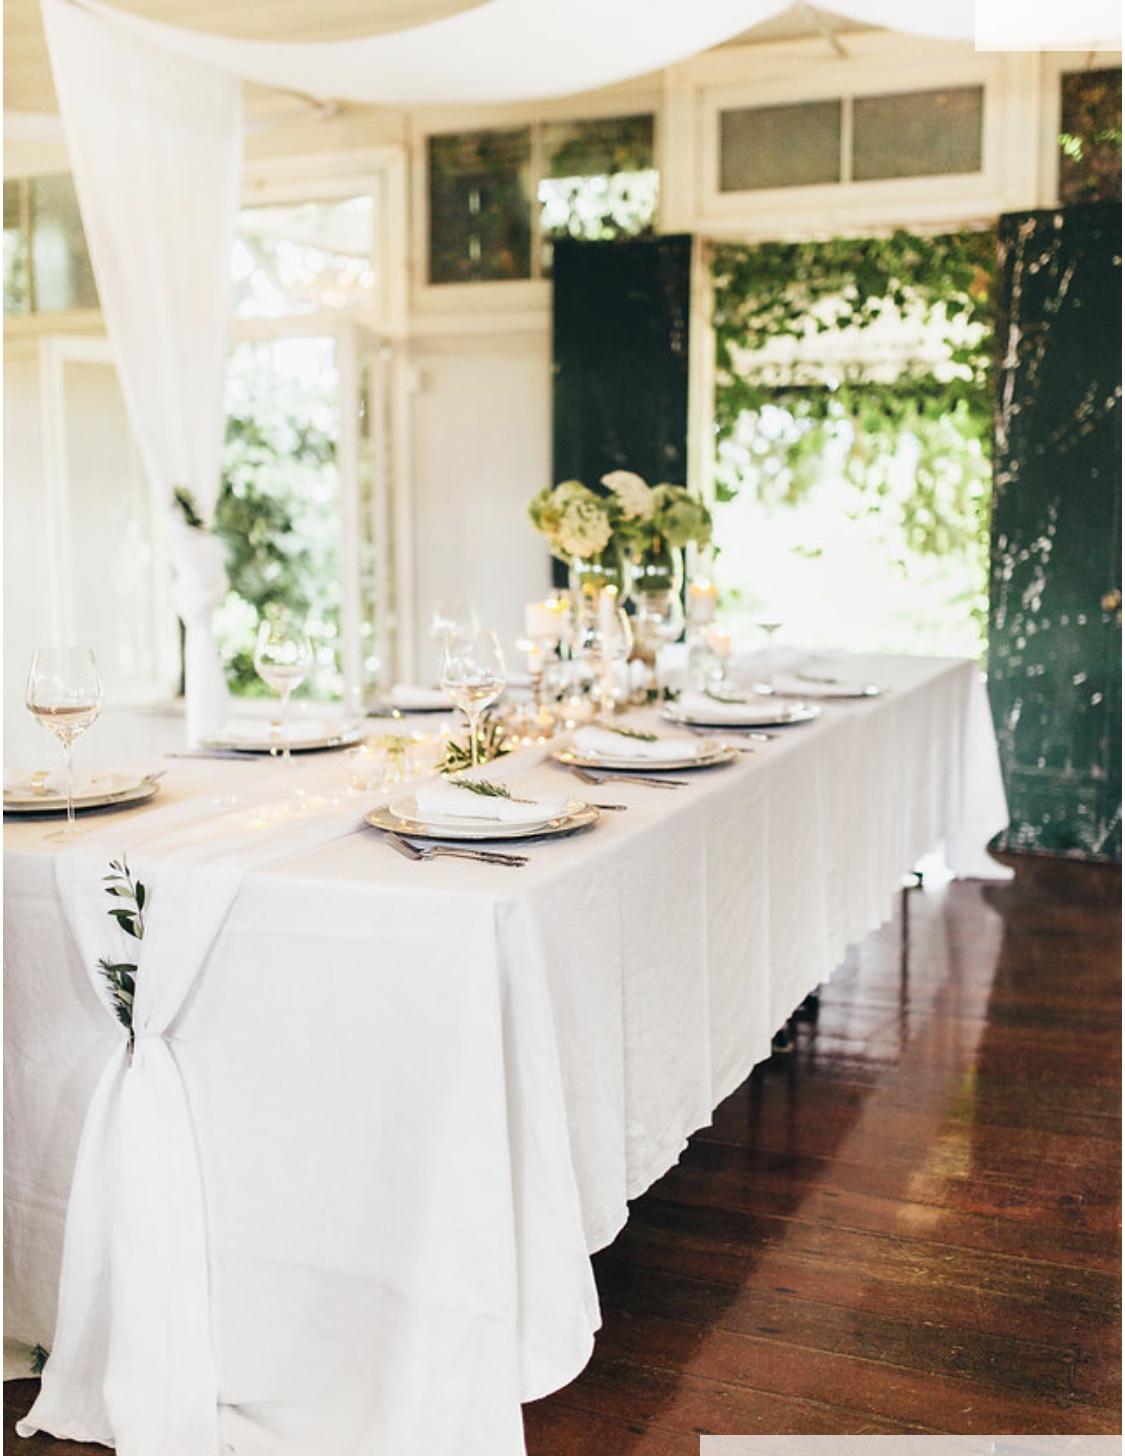 White 100% linen tablecloth and white crinkle line runner